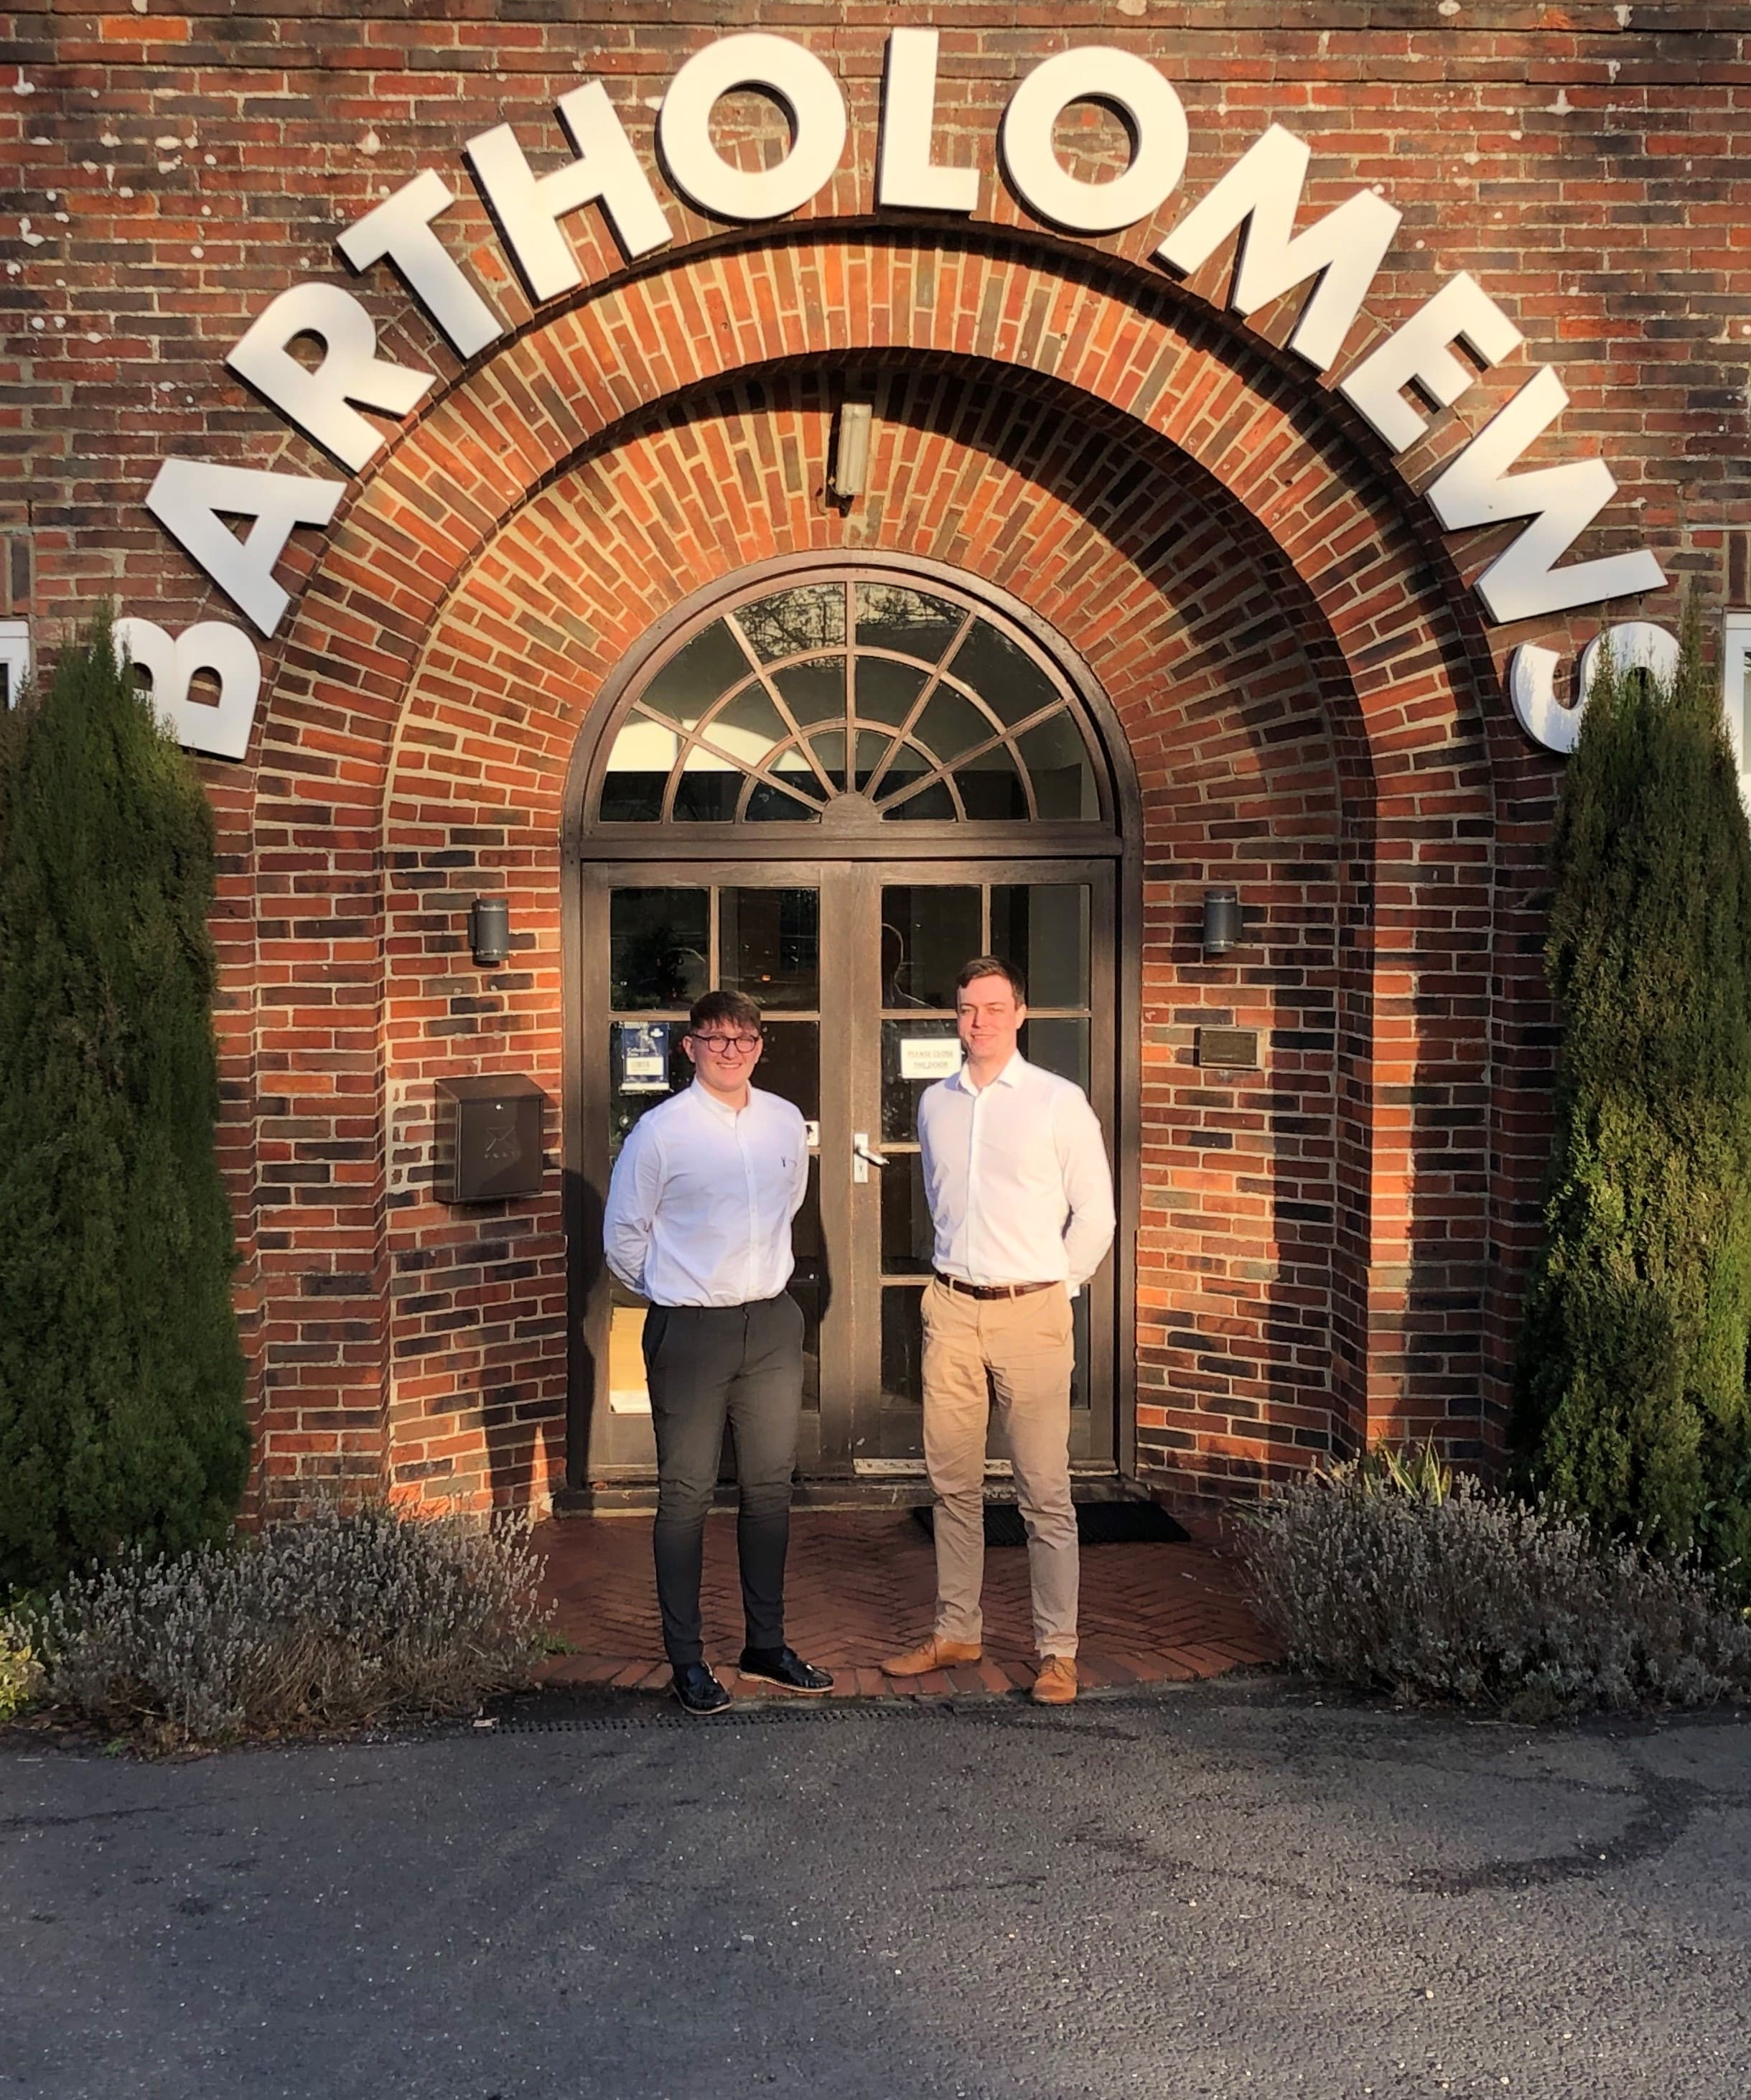 Morgan Shepherd (Left) and Tom McHarg (Right)